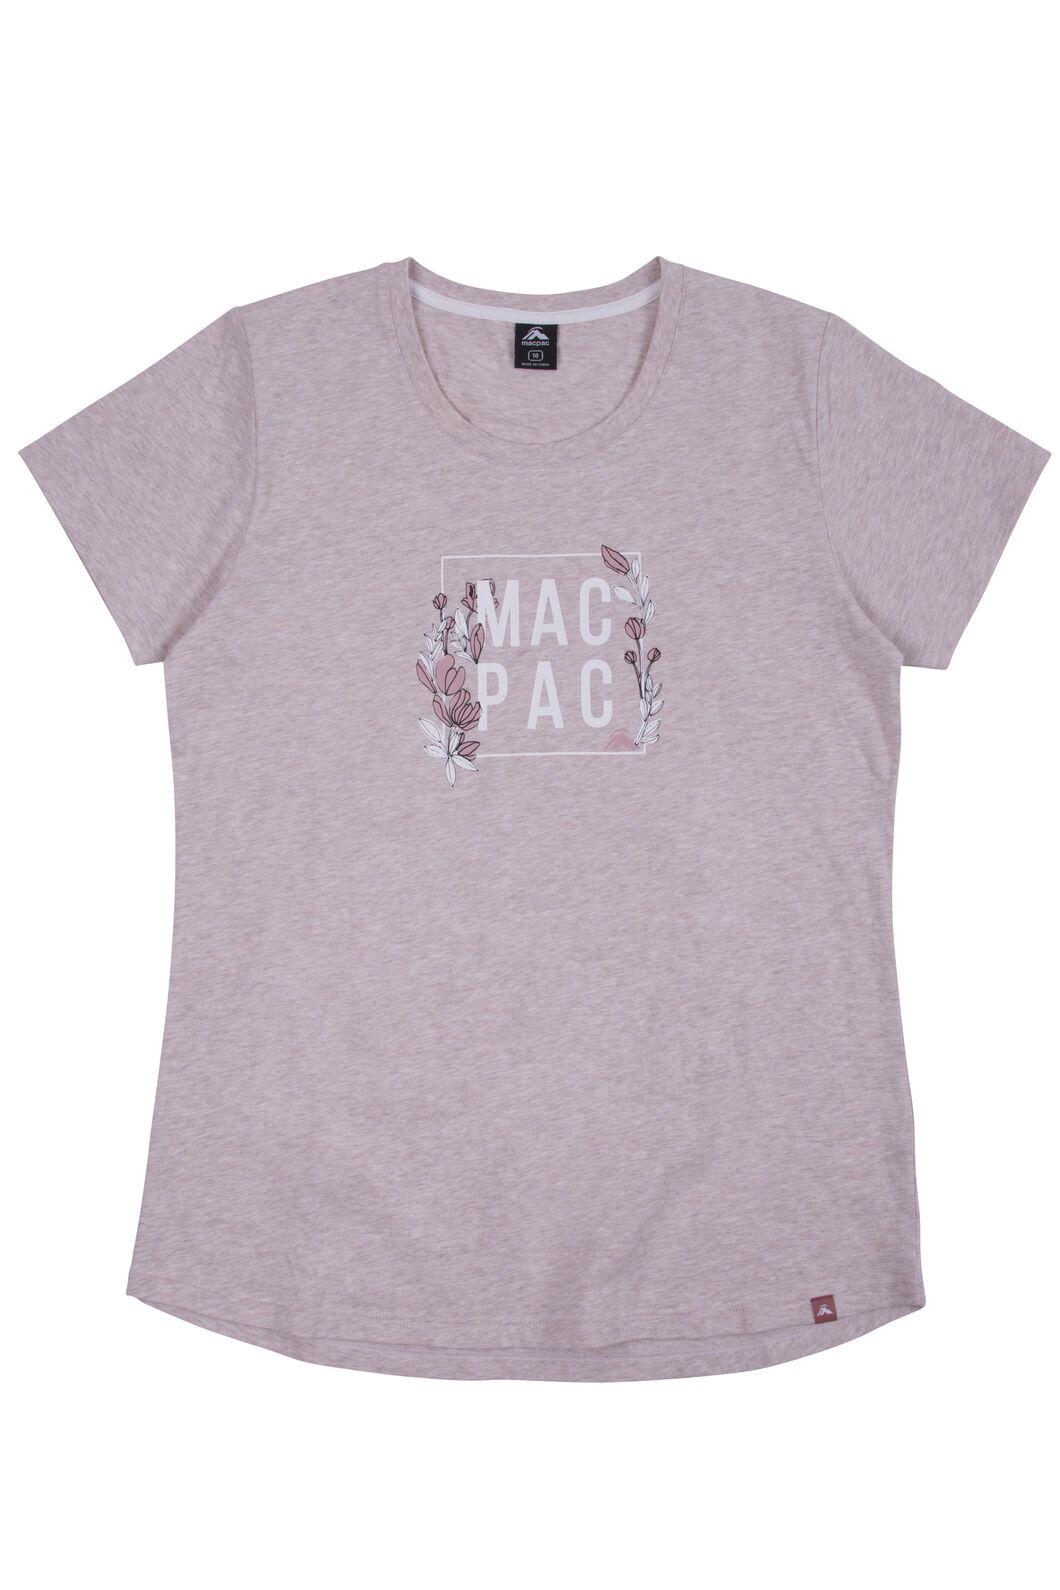 Macpac Cubed Organic Cotton Tee - Women's, Misty Rose Melange, hi-res